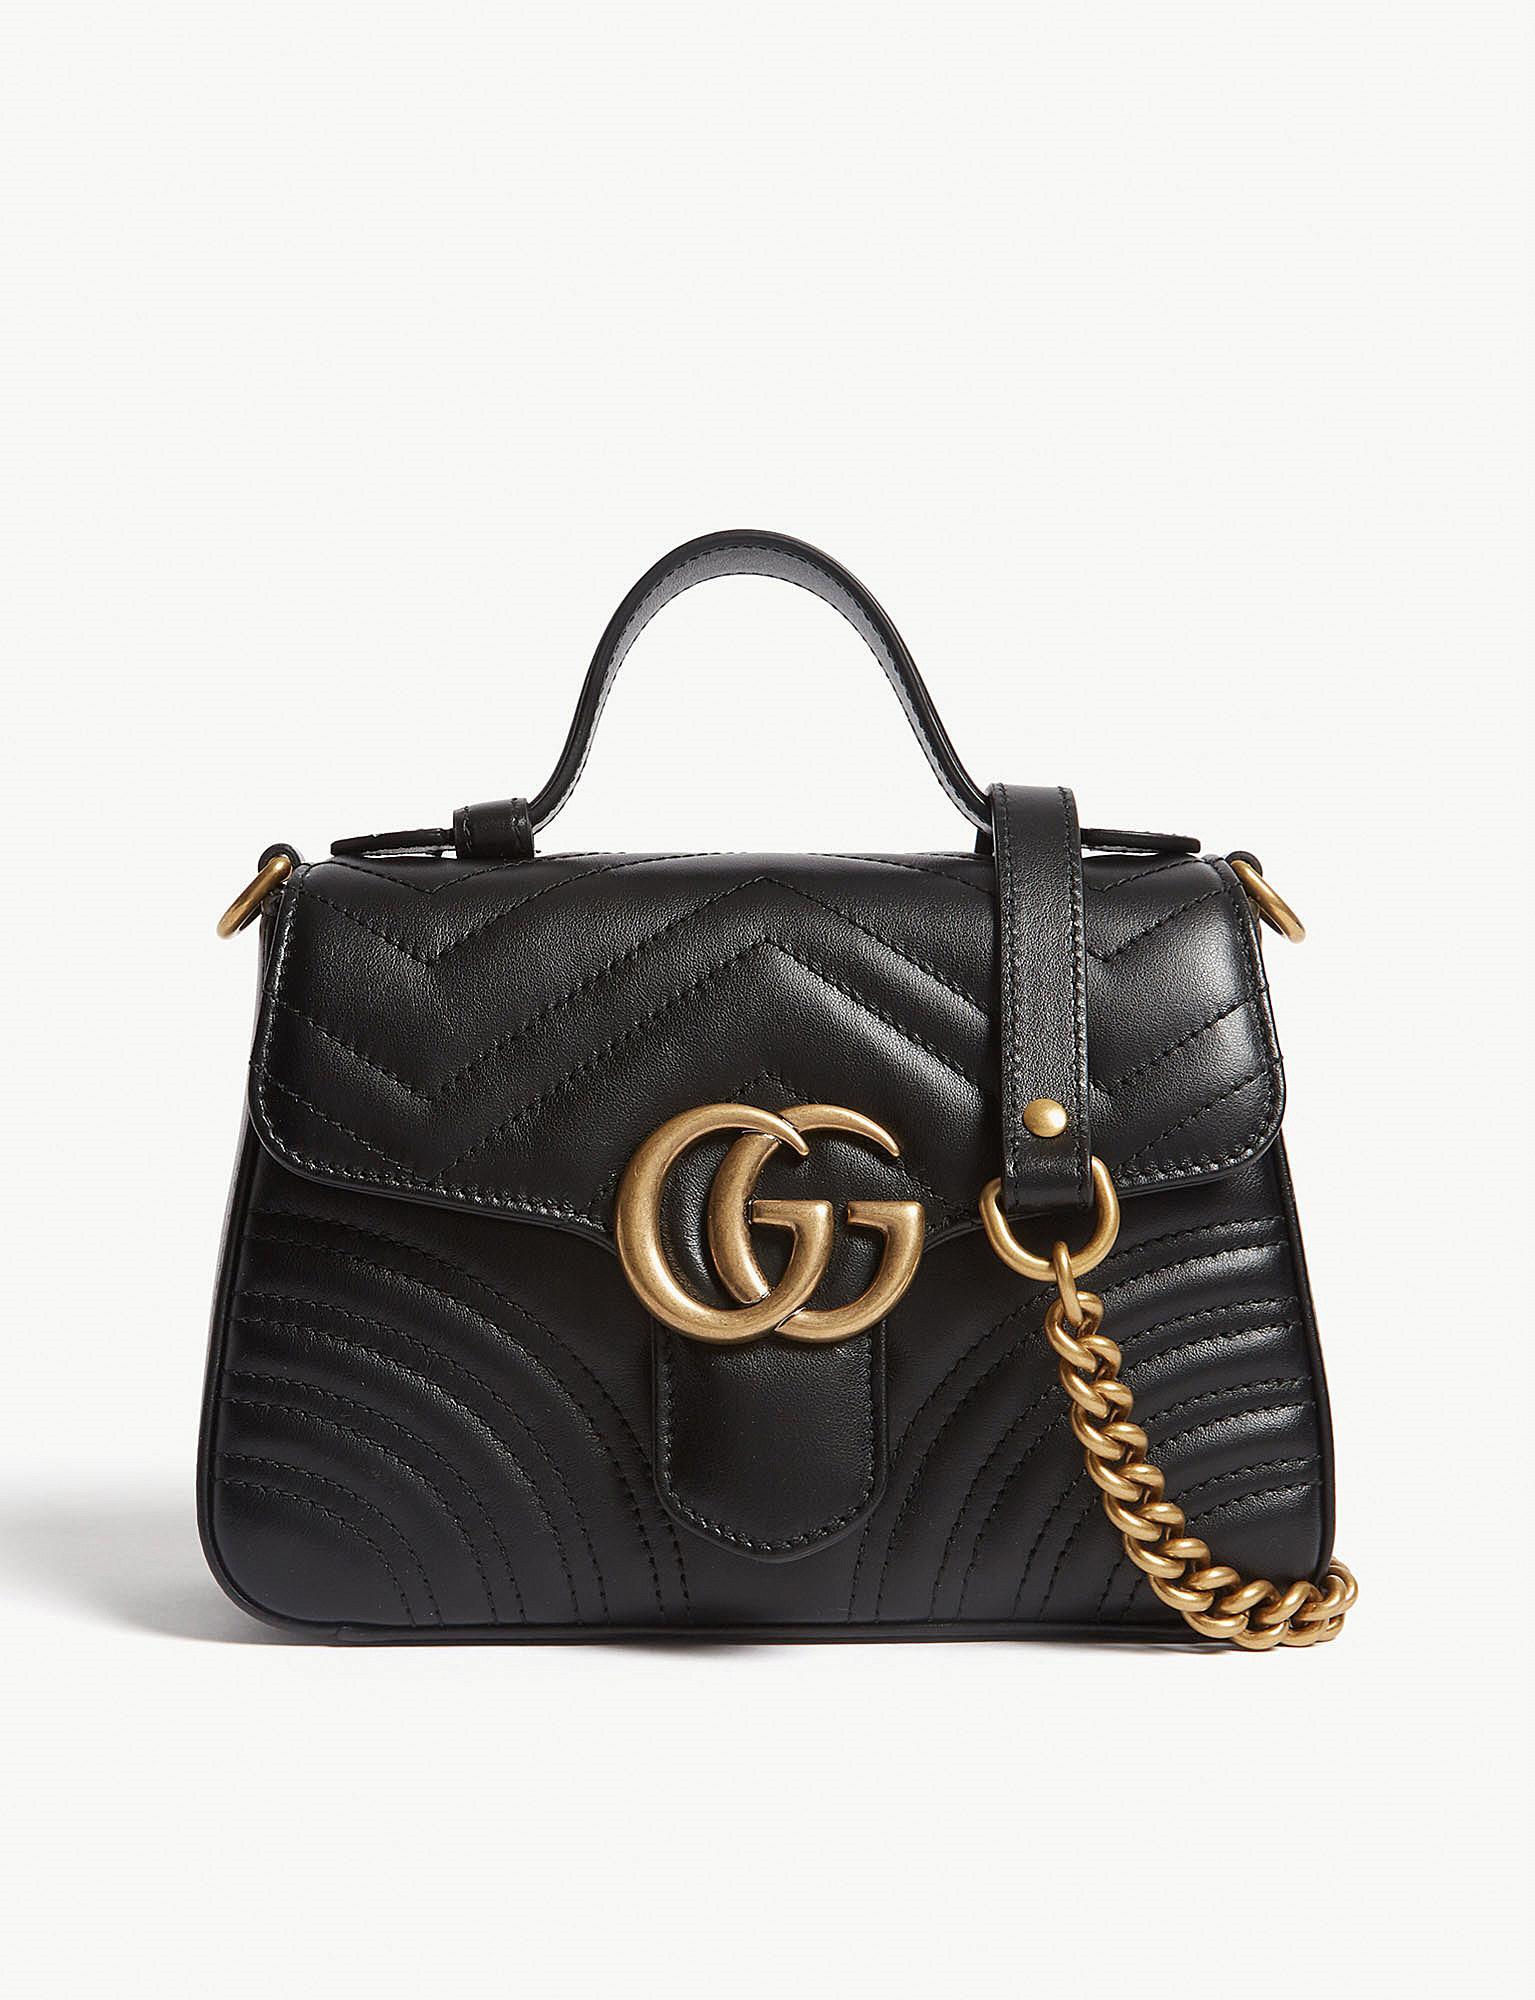 b0a99efed937 Lyst - Gucci Mini Marmont Shoulder Bag in Black - Save 36%